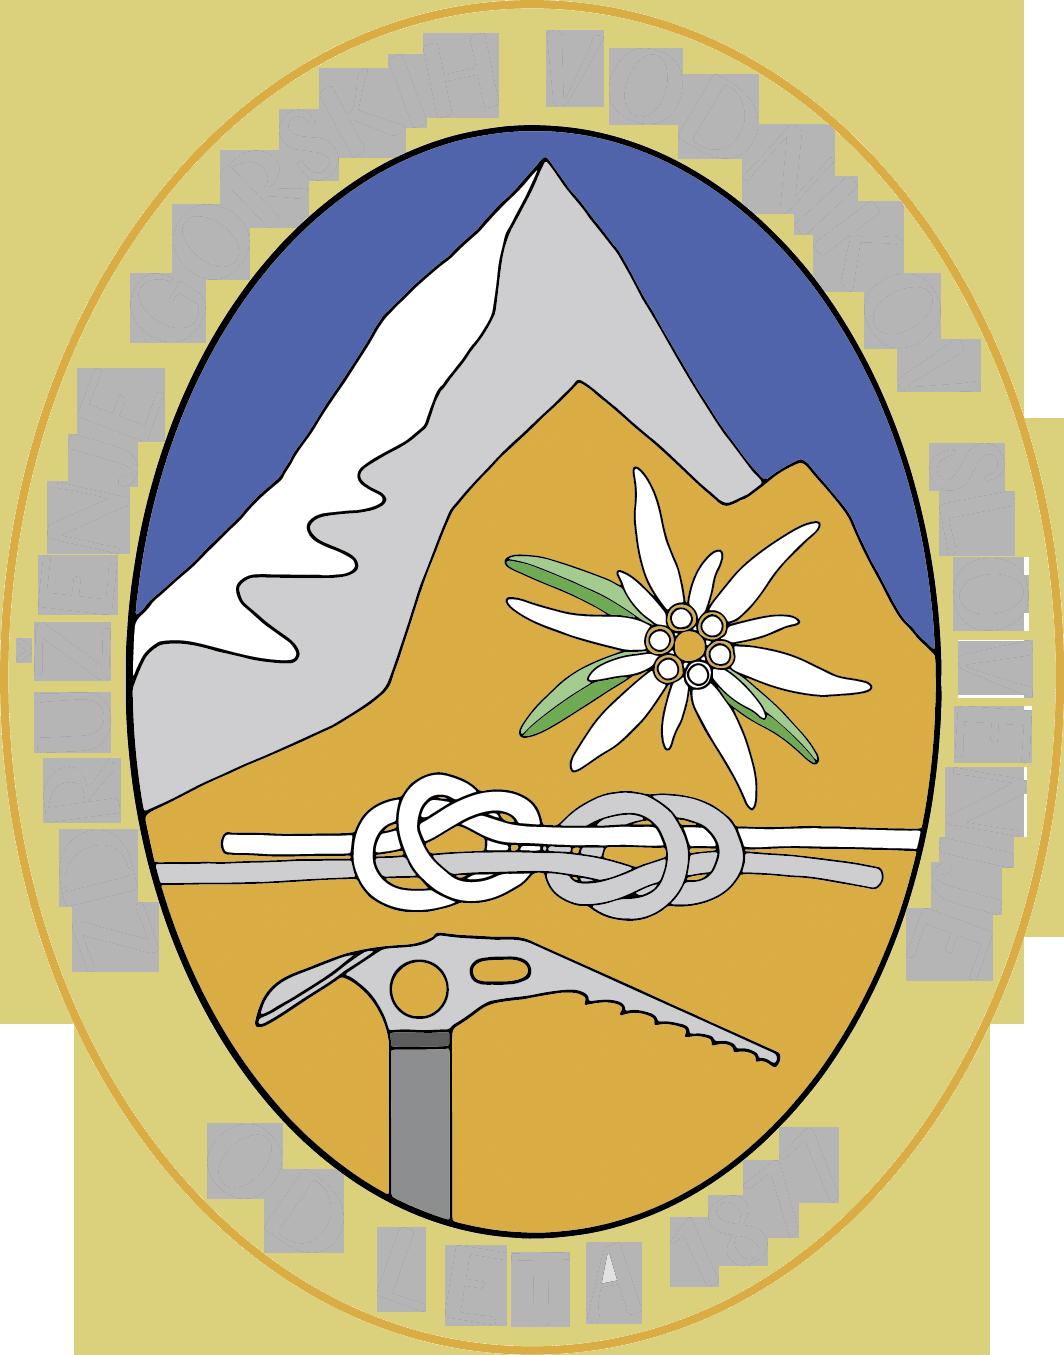 Zgvs slovenian mountain guides. Clipart mountains mountaineering